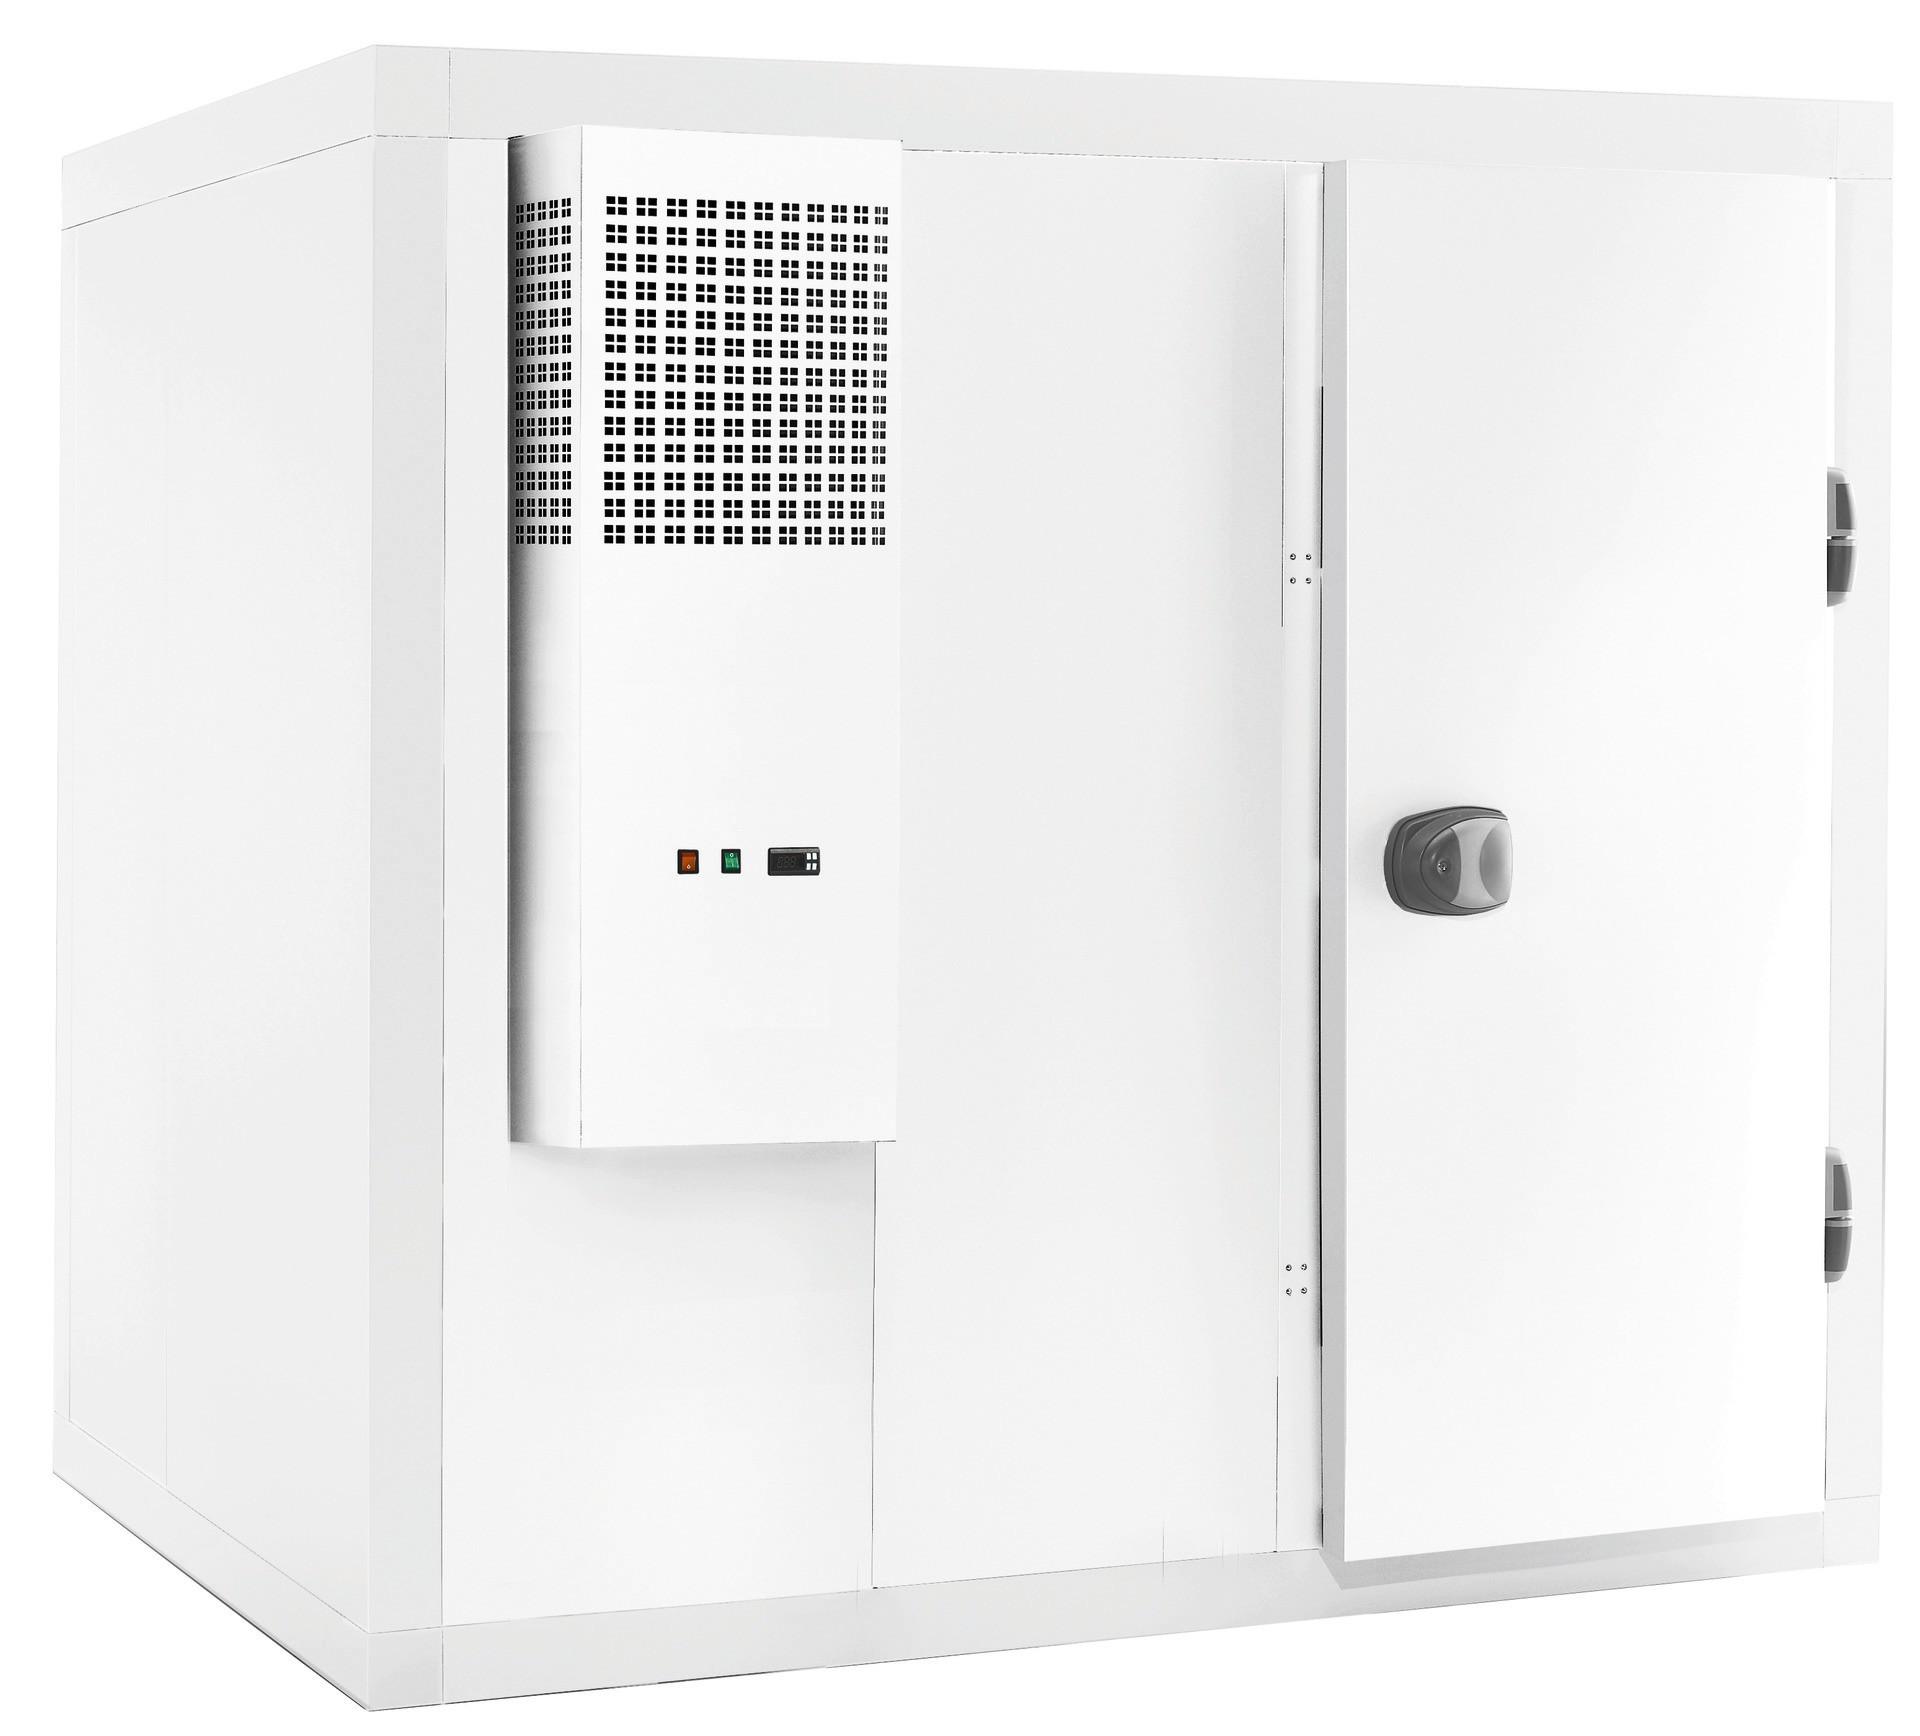 Tiefkühlaggregat für Kühlzelle 661036, 661037, 661039, 661041